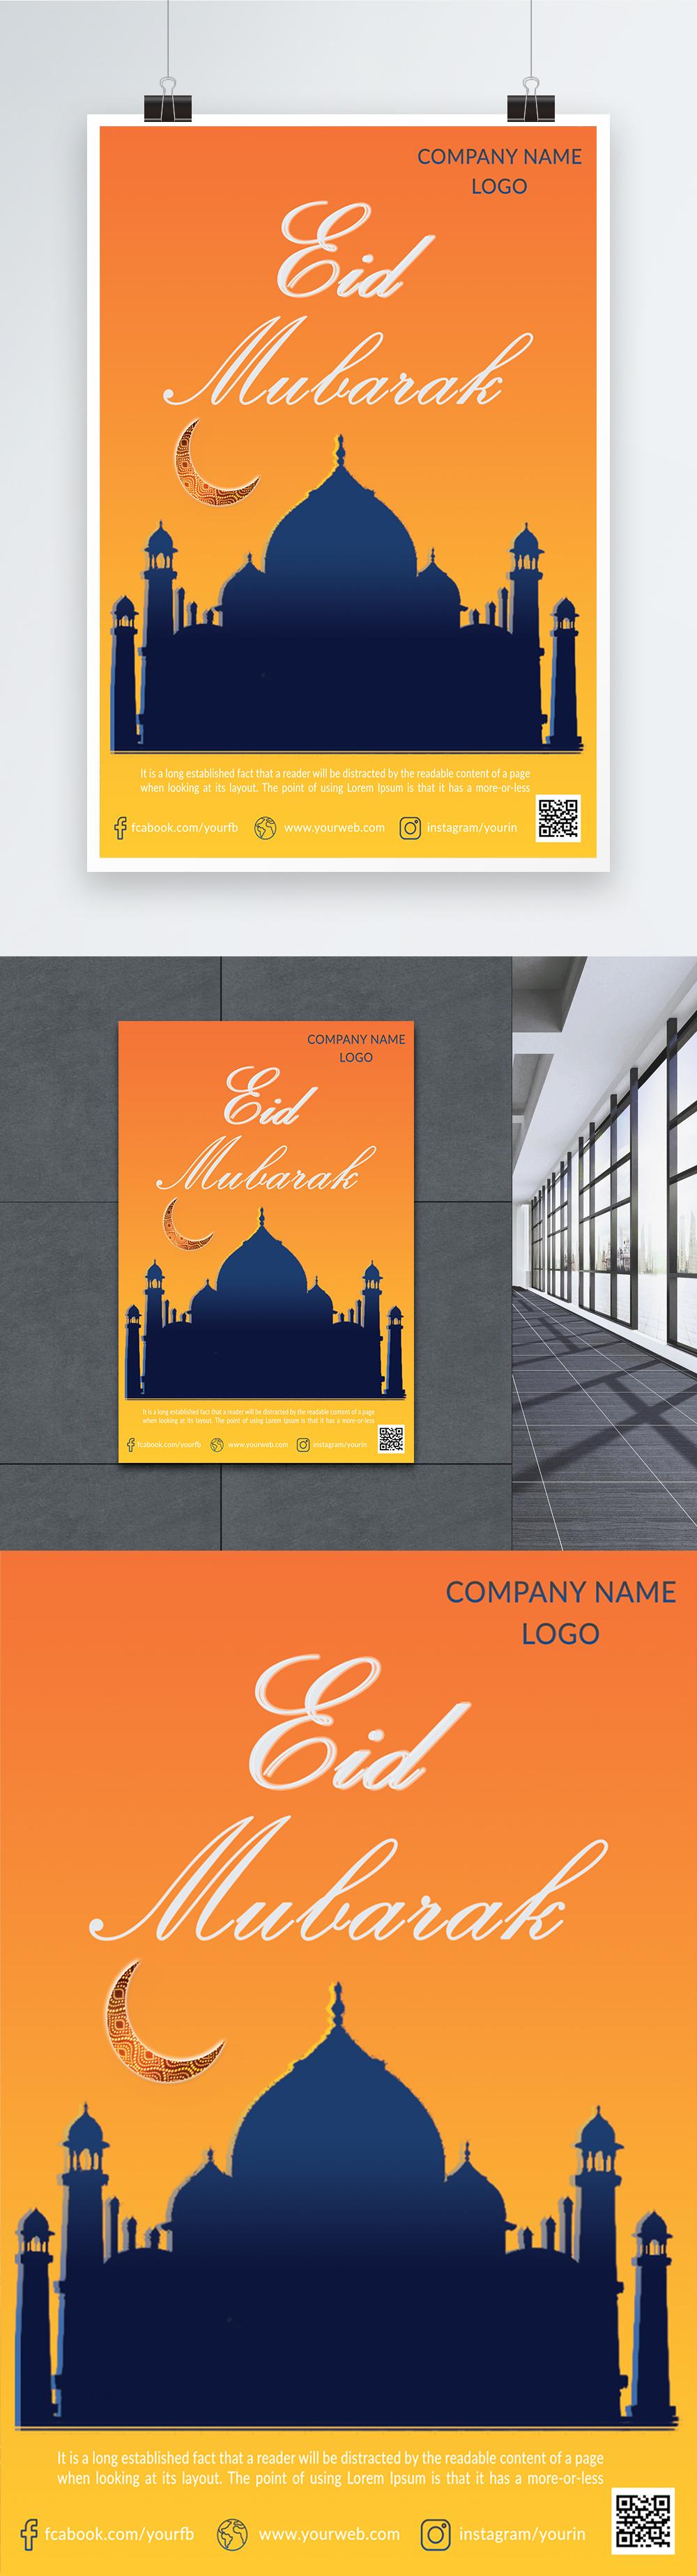 eid mubarak creative poster background images hd ai poster backgrounds 450012514 lovepik com eid mubarak creative poster background